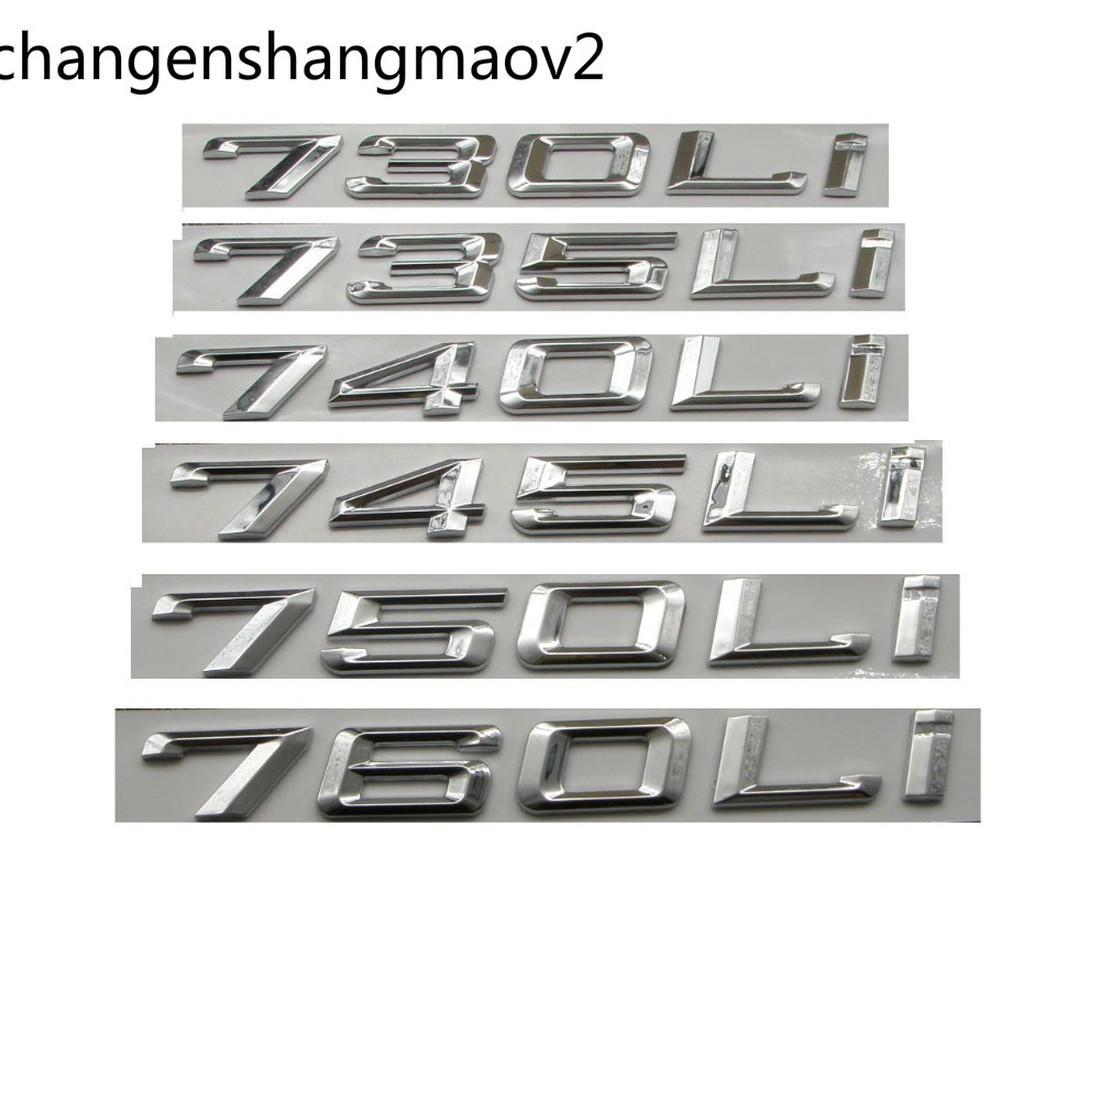 Chrome Silver Номер буквы автомобильных багажников Знак эмблемы эмблемы для BMW 7 серии 745i 740i 750i 730Li 735Li 740Li 750Li 745Li 760Li